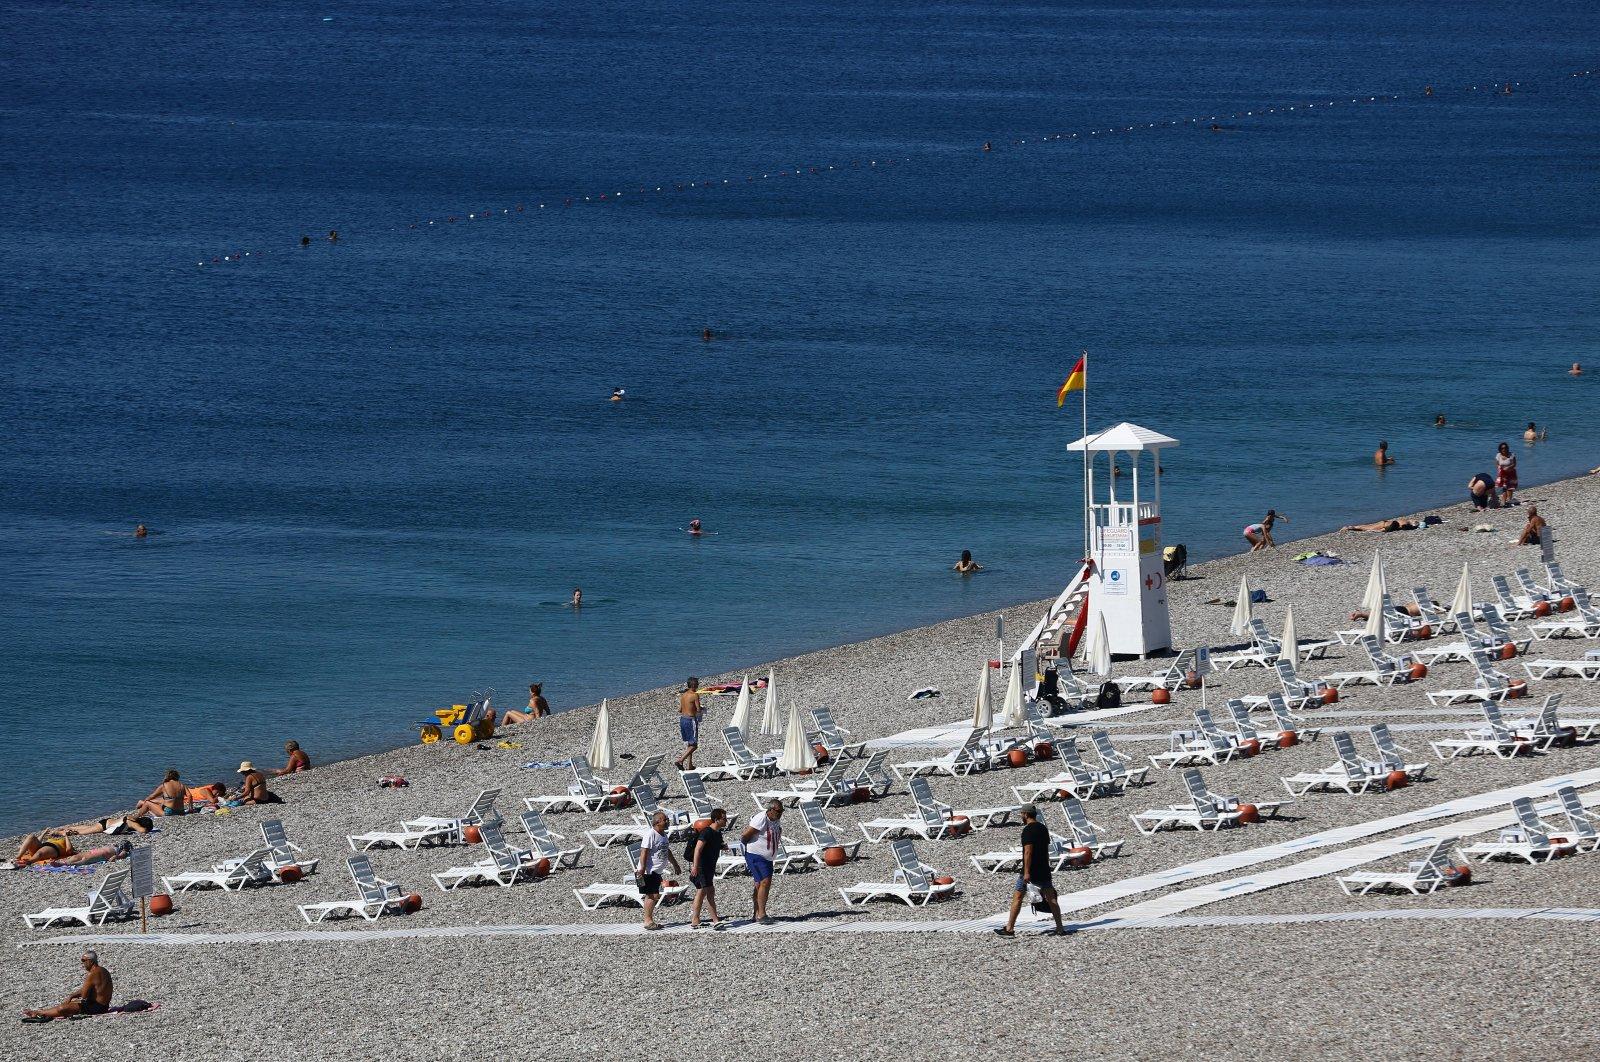 People sunbathe on Konyaaltı beach in the southern resort city of Antalya, Turkey, amid the COVID-19 outbreak, on June 19, 2020. (Reuters Photo)